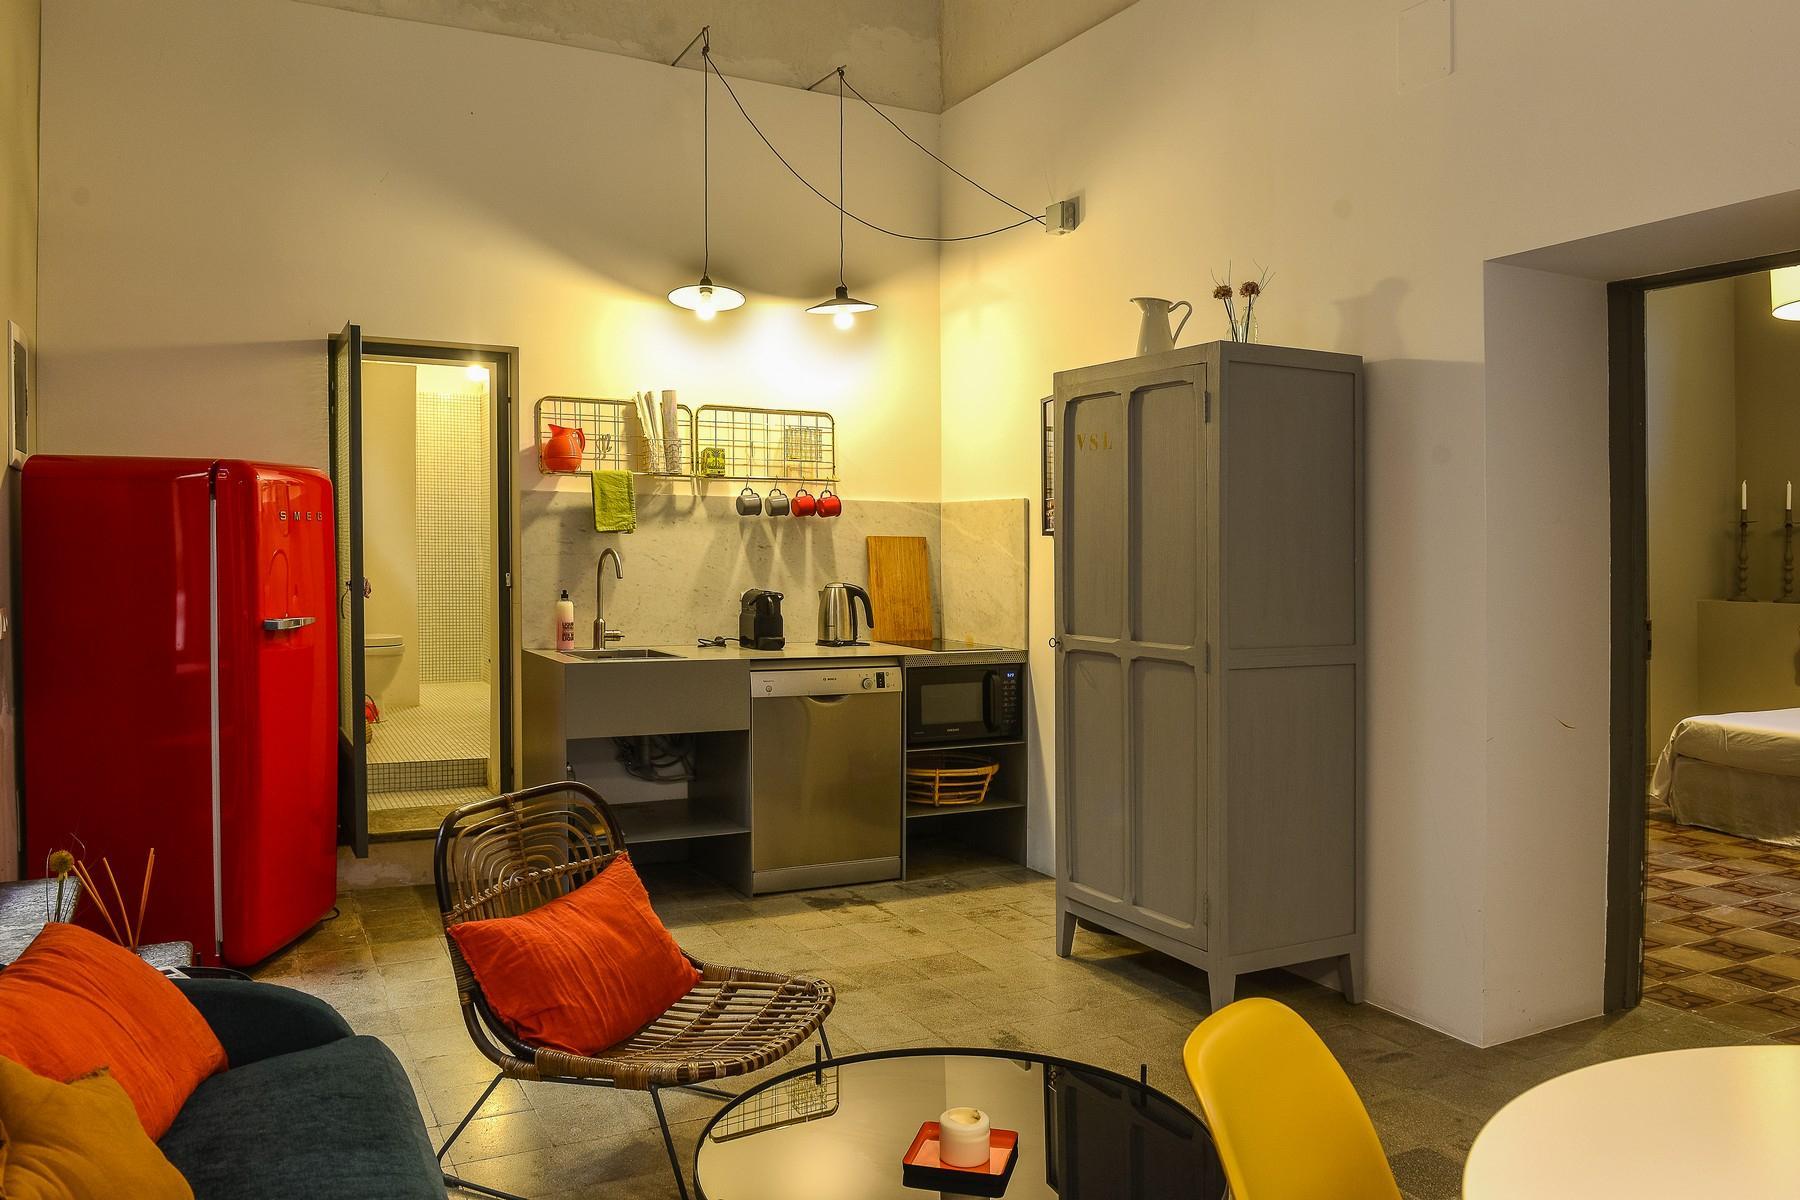 Noto铺设着原始地板的公寓 - 11